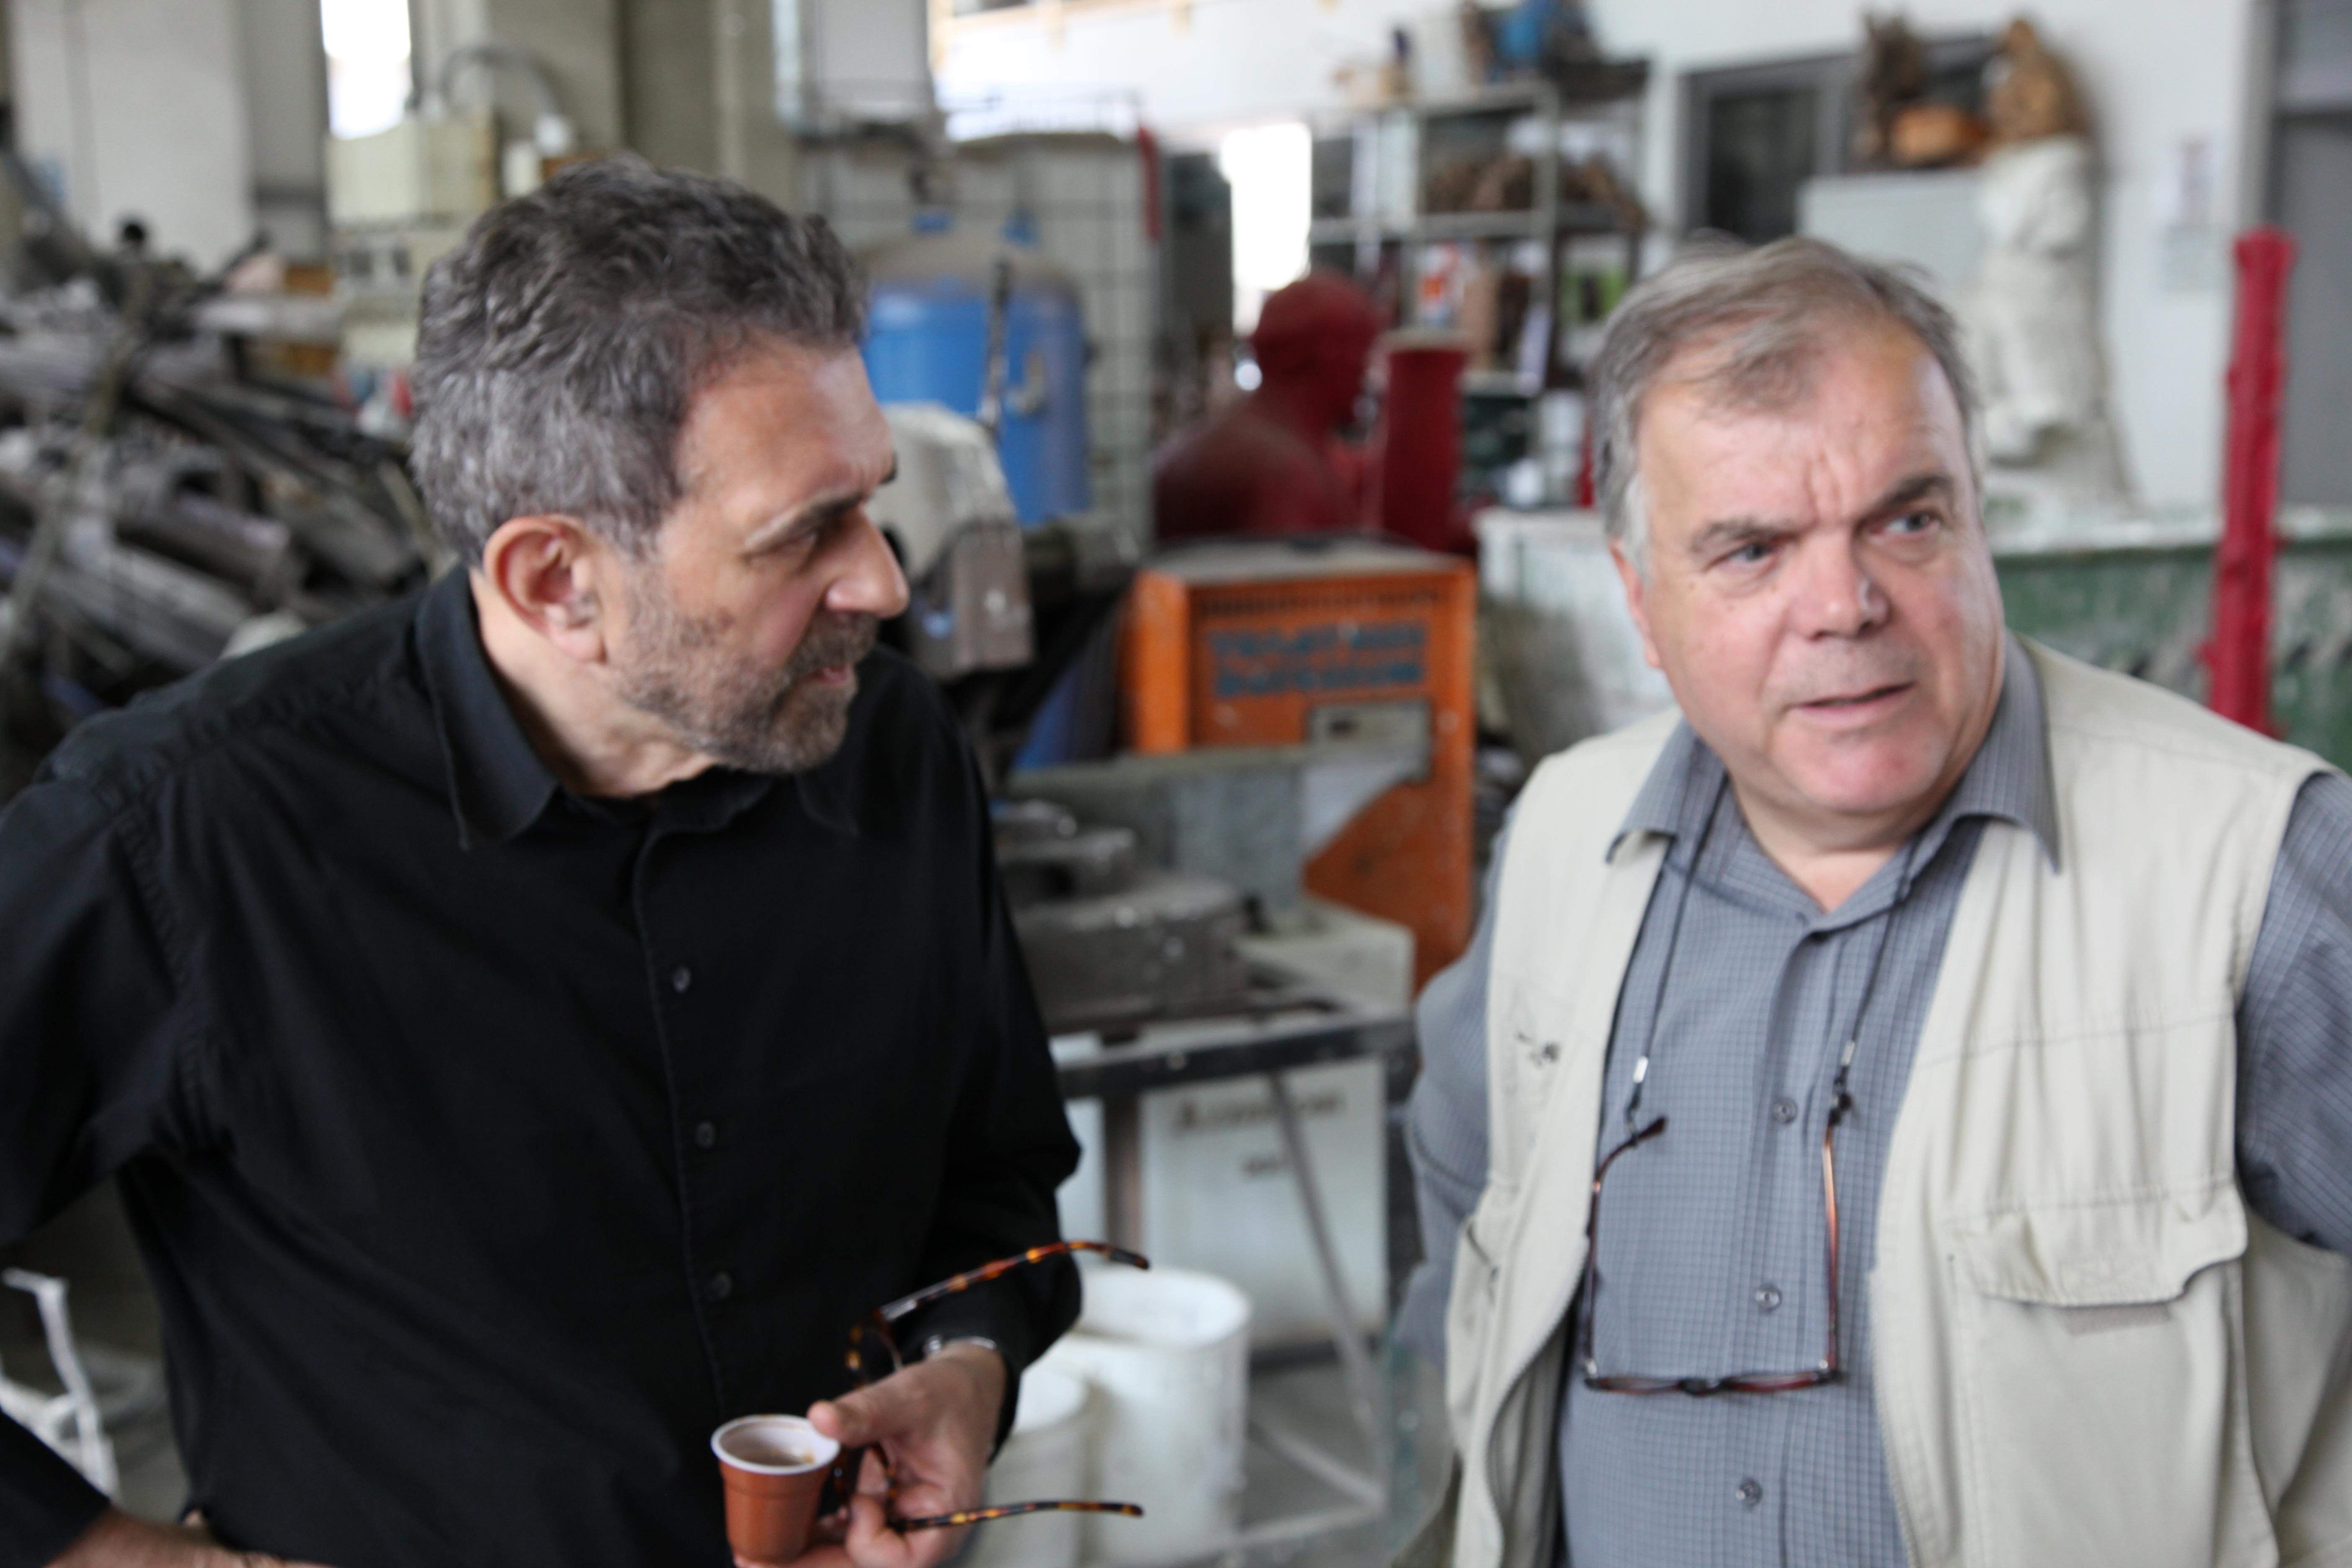 Grisha Bruskin ed Enrico Salvadori